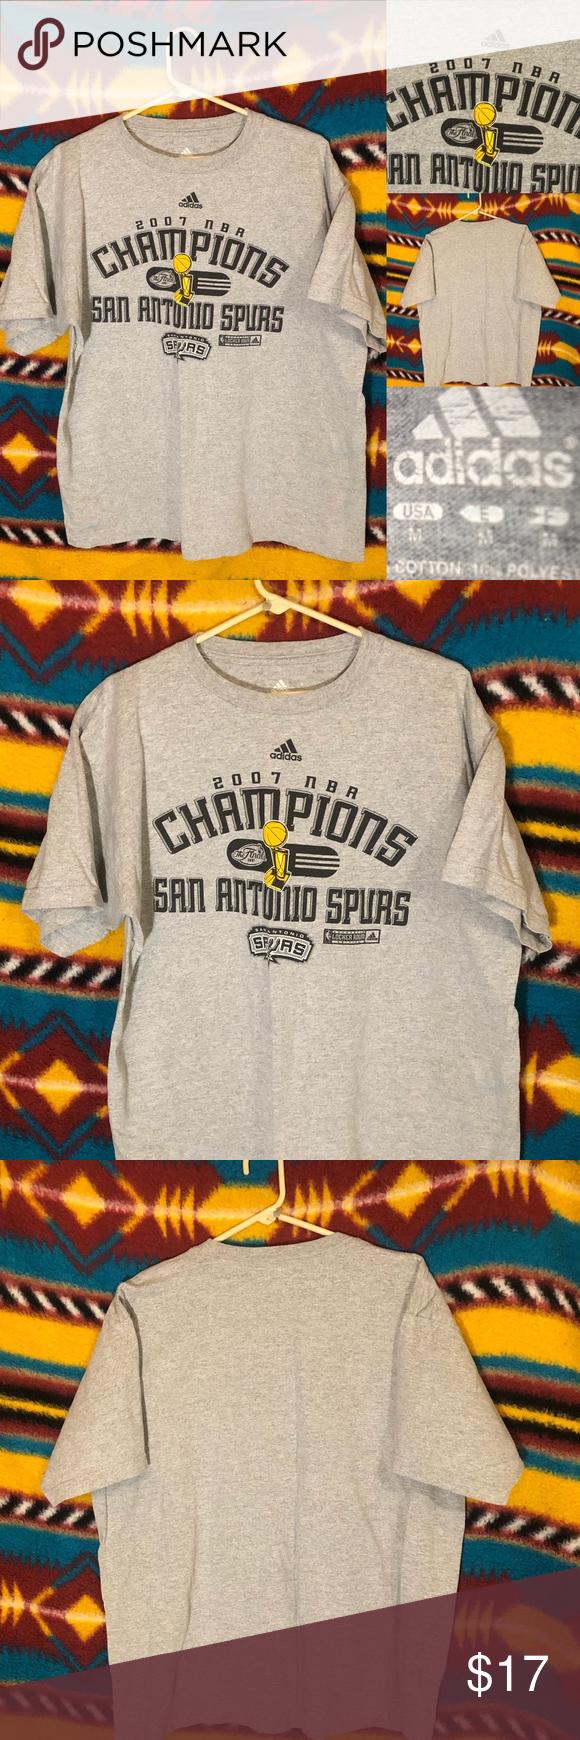 2007 San Antonio Spurs Championship T Shirt Size M Shirt Design Inspiration T Shirt Flowers Shirts [ 1740 x 580 Pixel ]